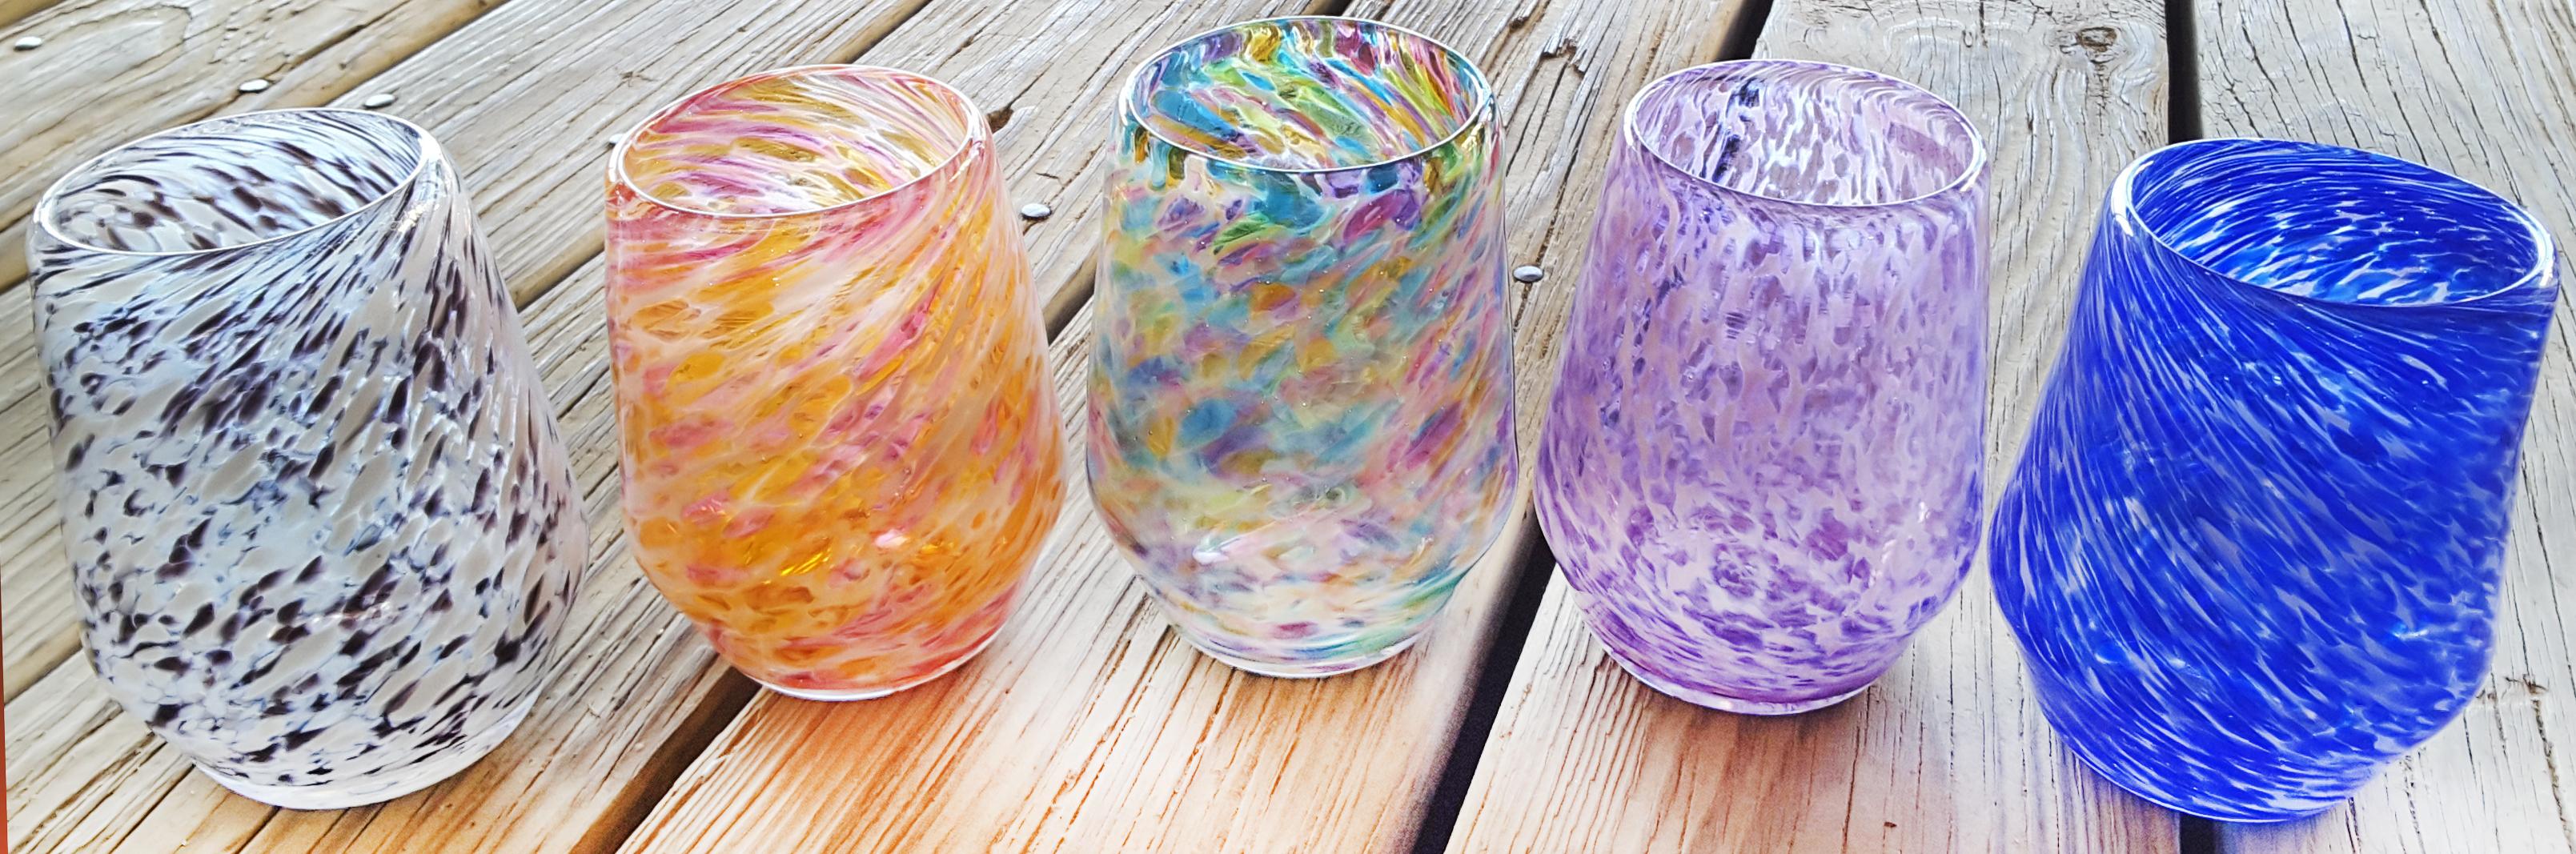 Slider-Wine-Glass-Help-Create-Vetro-Sep-2018